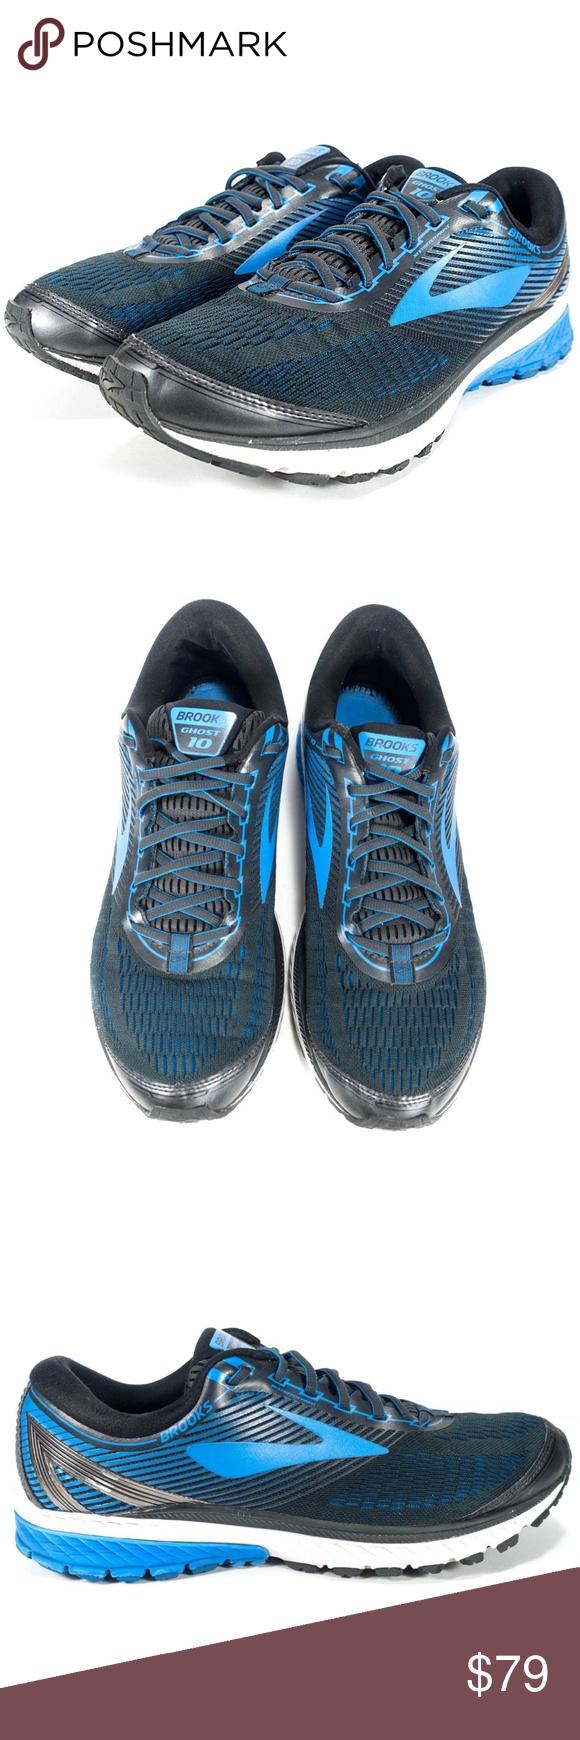 ec15eb050202a Brooks Ghost 10 Running Shoes Mens Sz 12 No Insole Brooks Ghost 10 Running  Shoes -